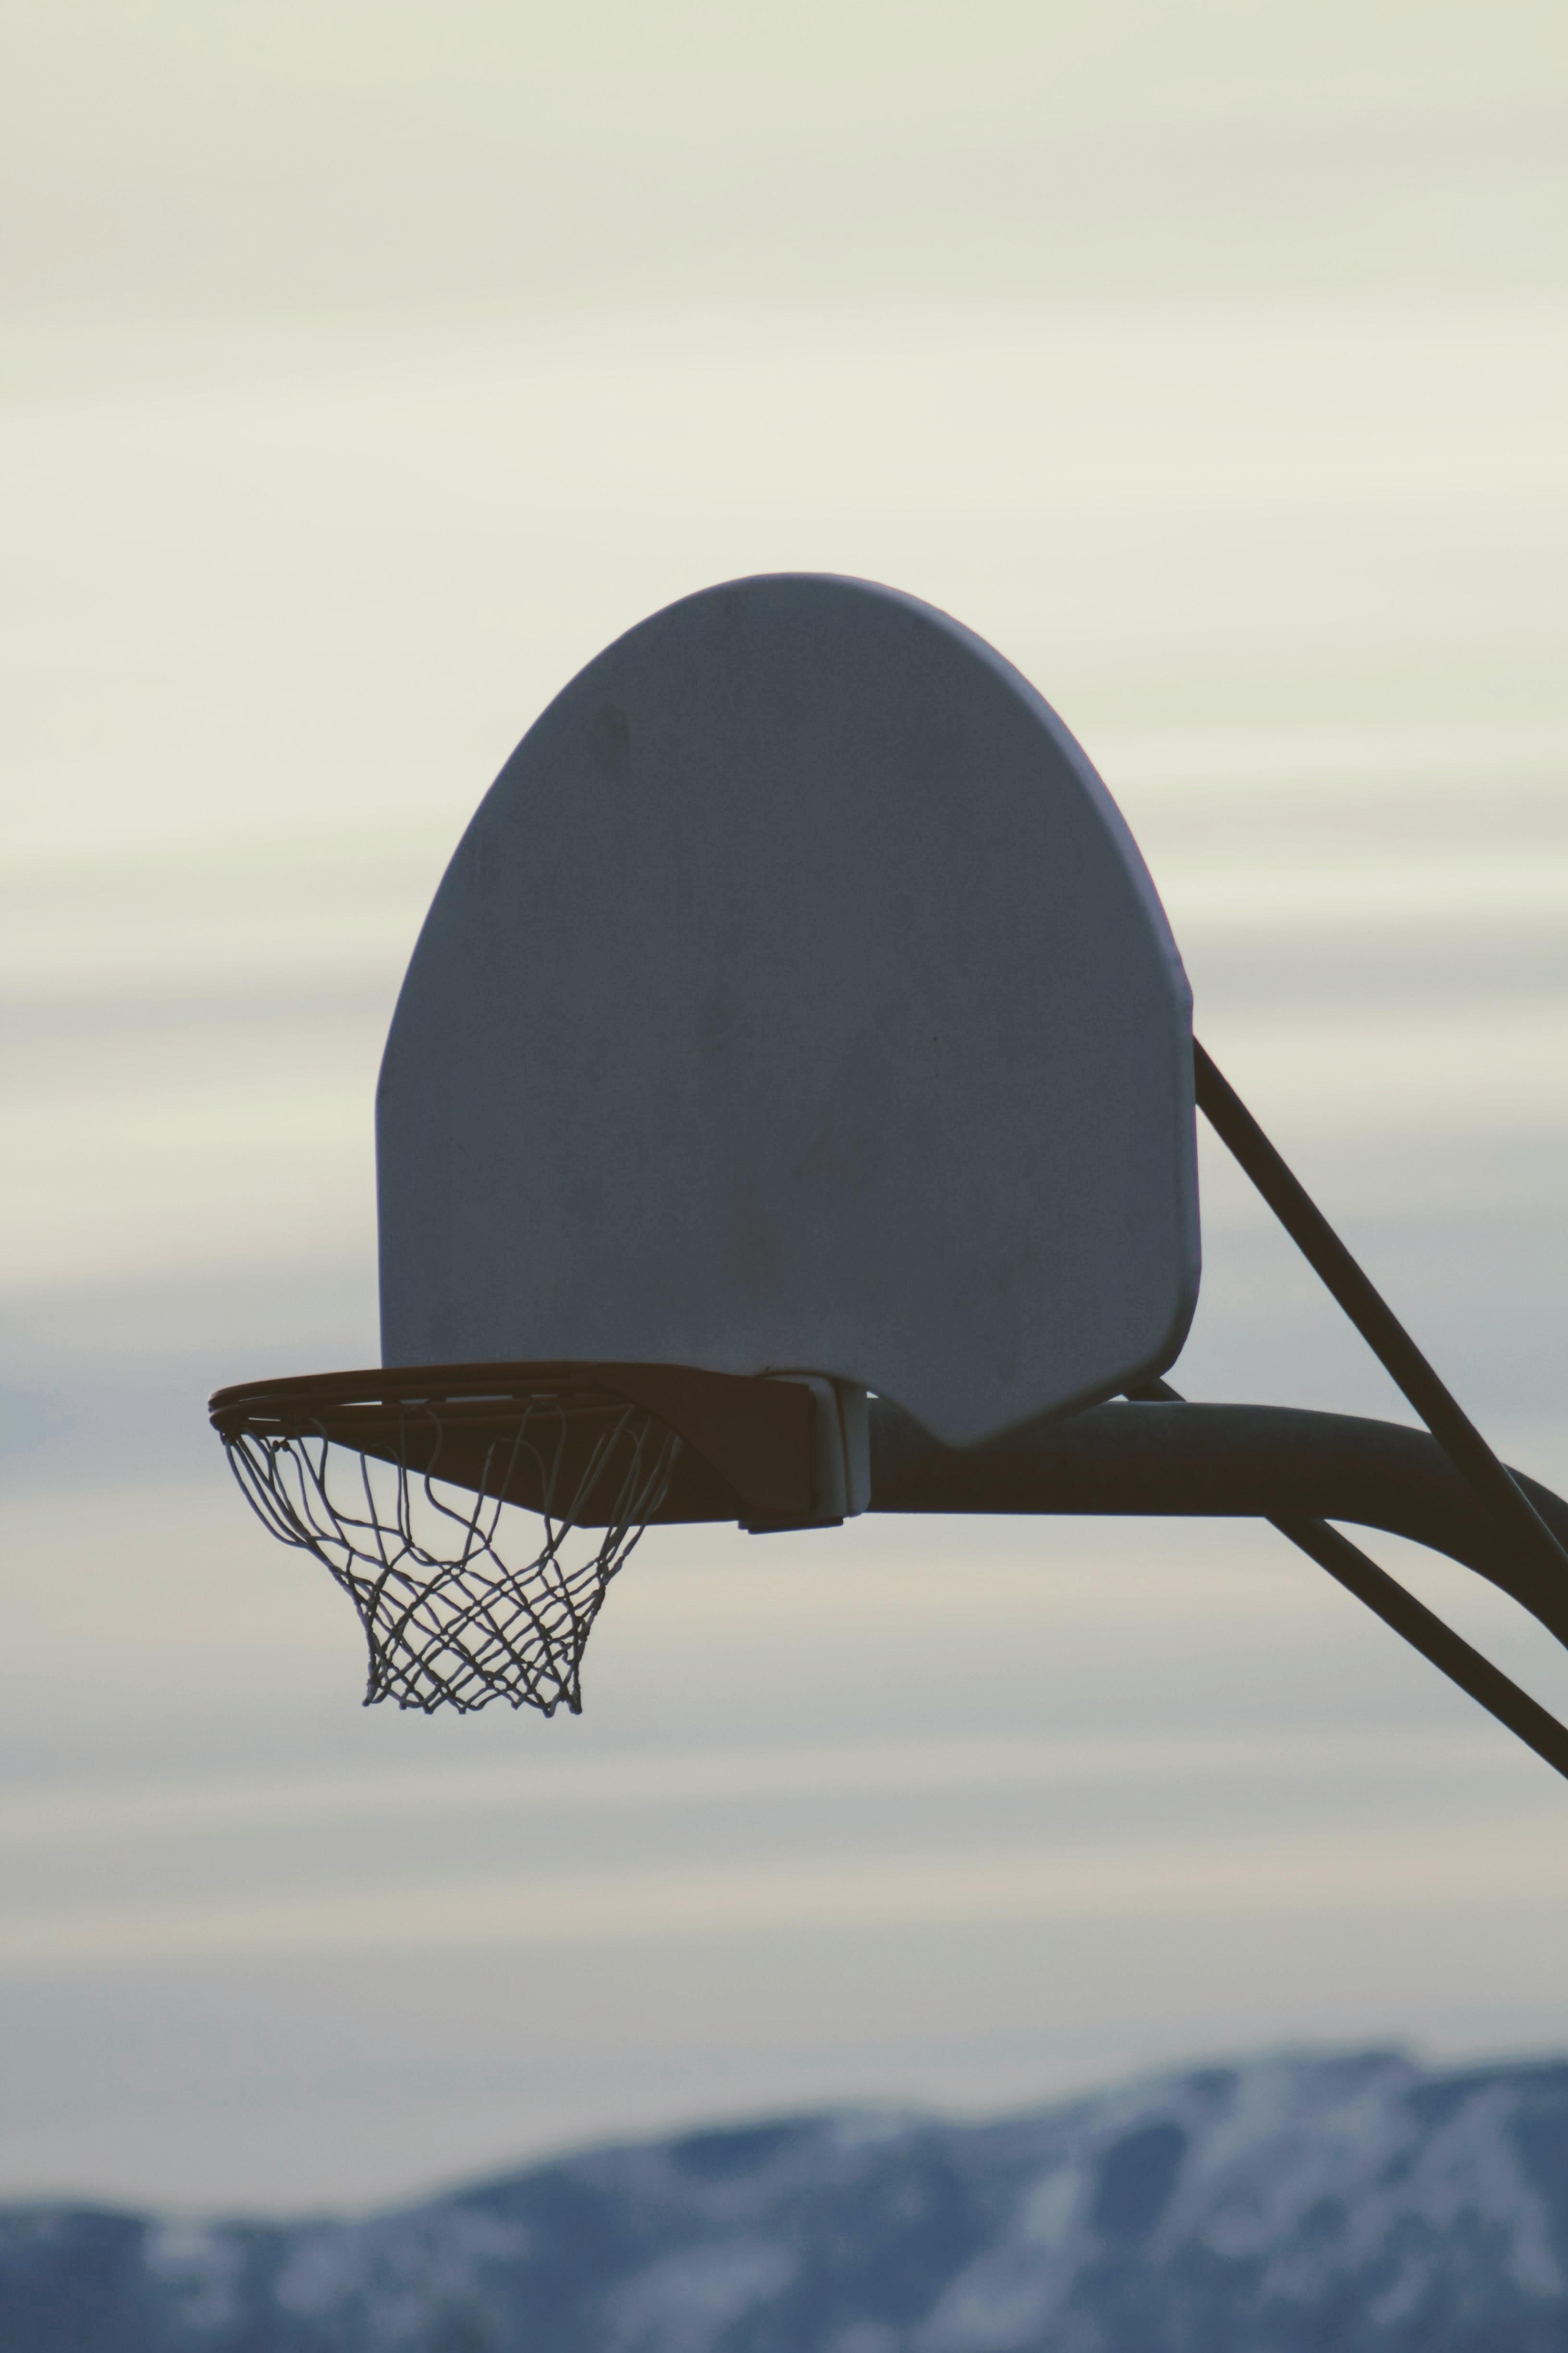 selective focus photography of basketball hoop